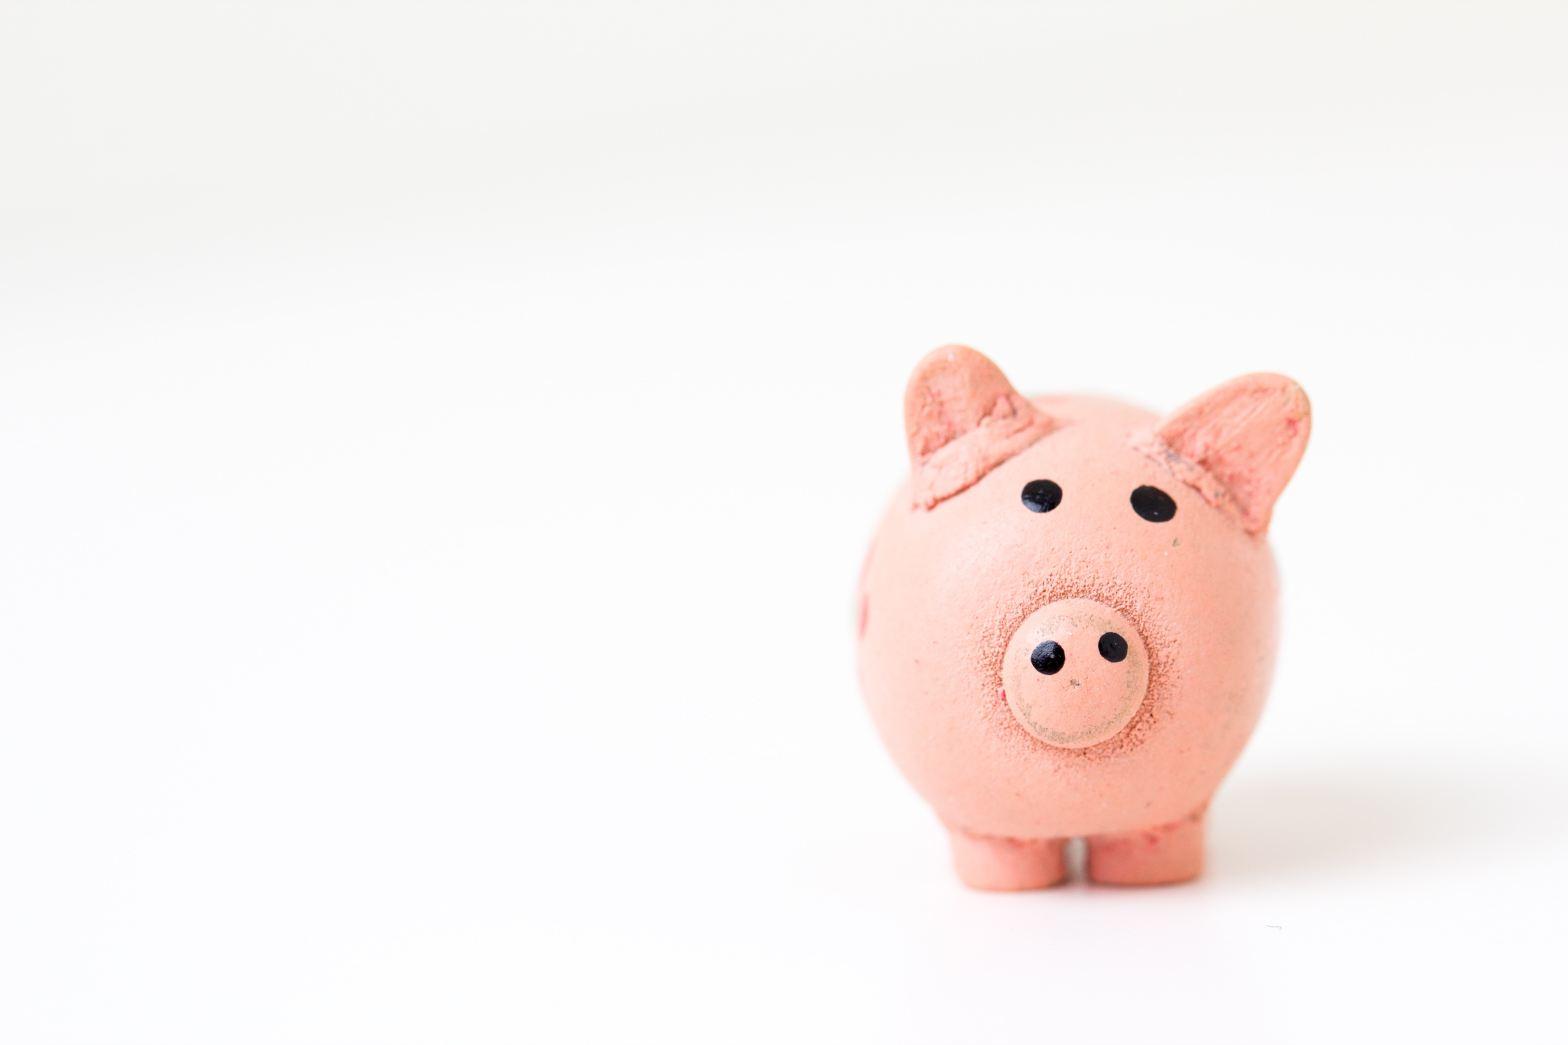 pink piggy bank shaped like a pig